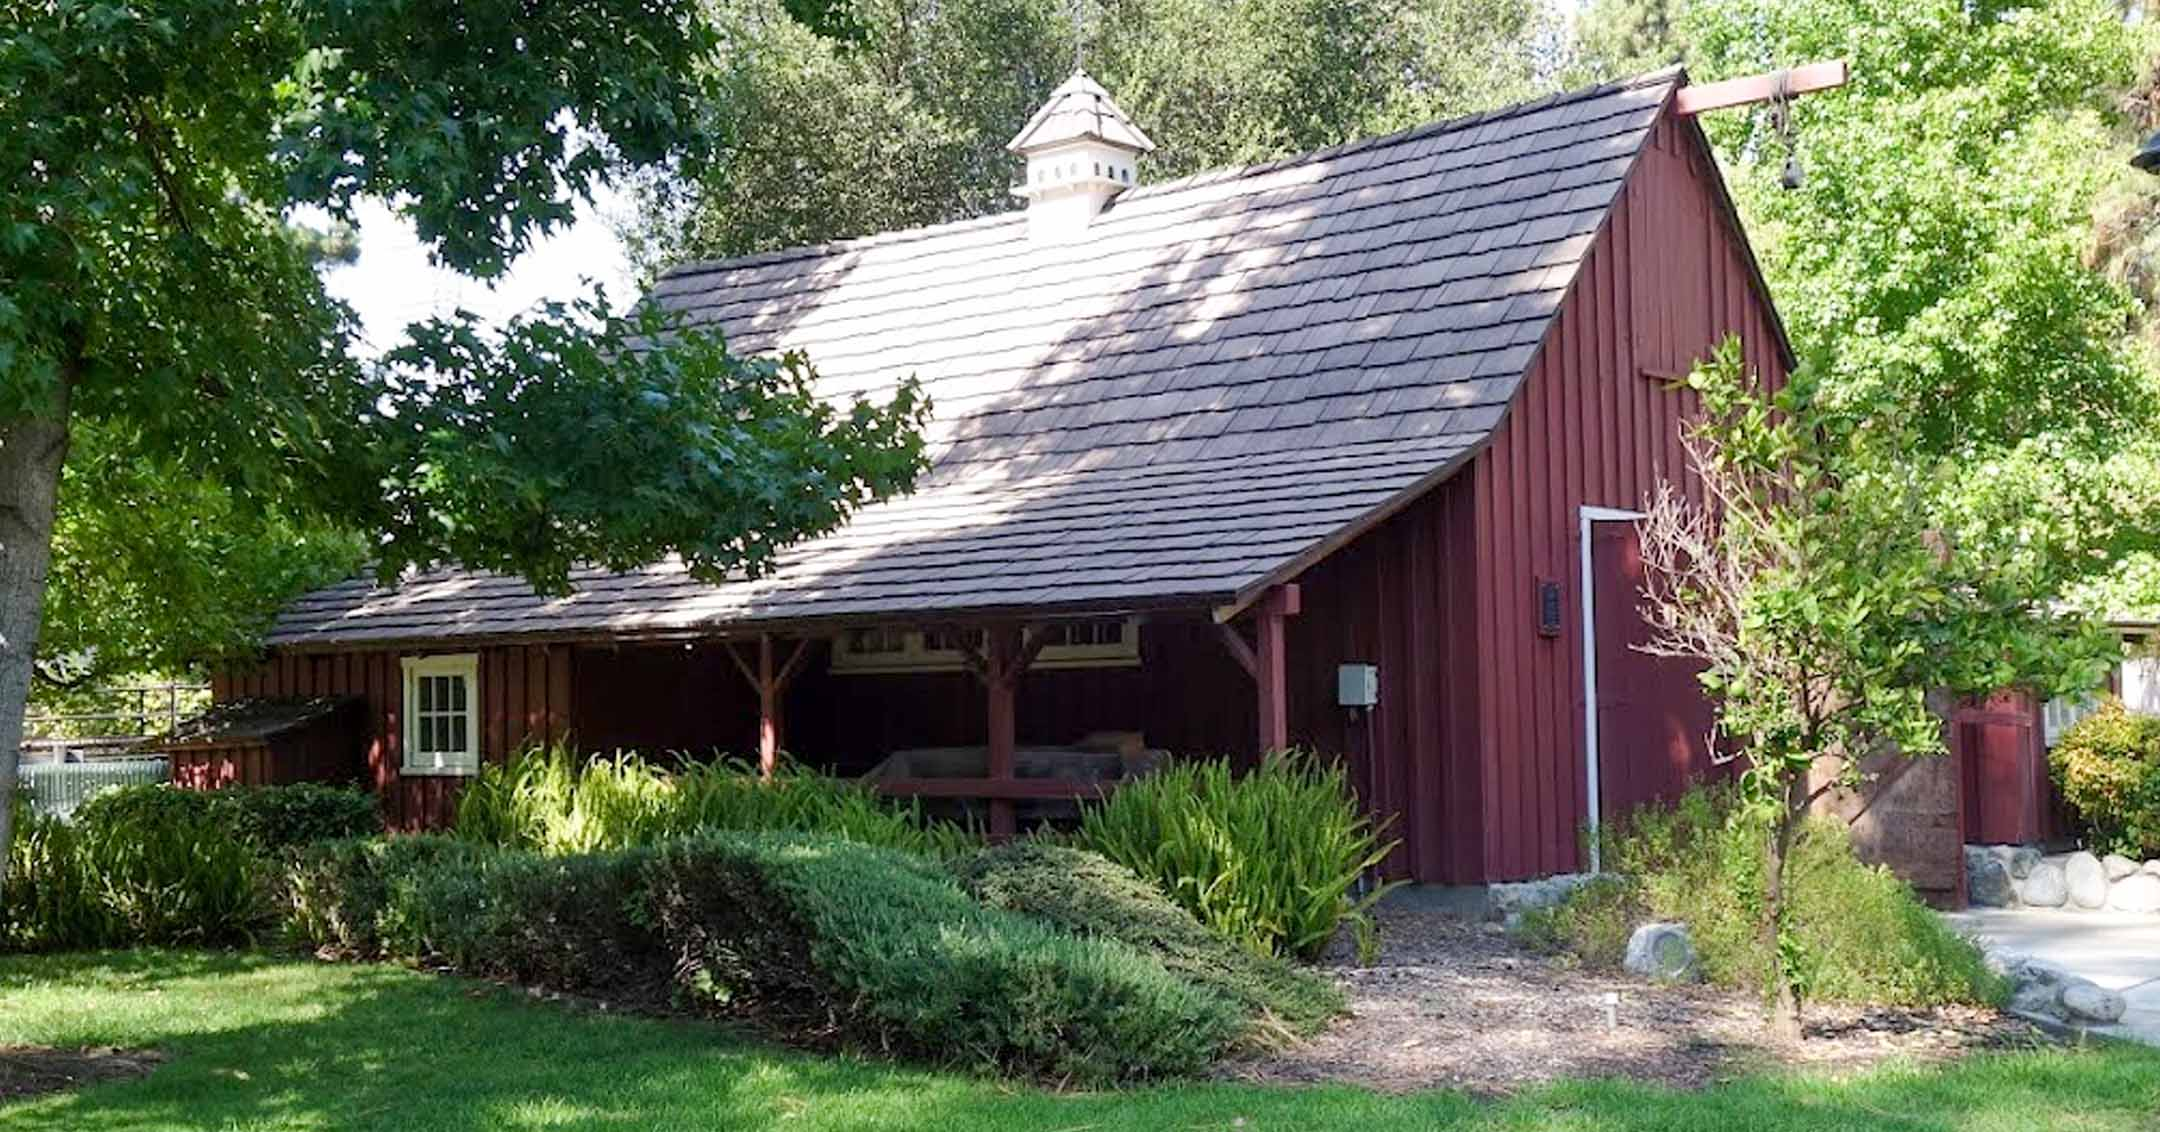 Walt's Barn Open to the Public | Carolwood.org